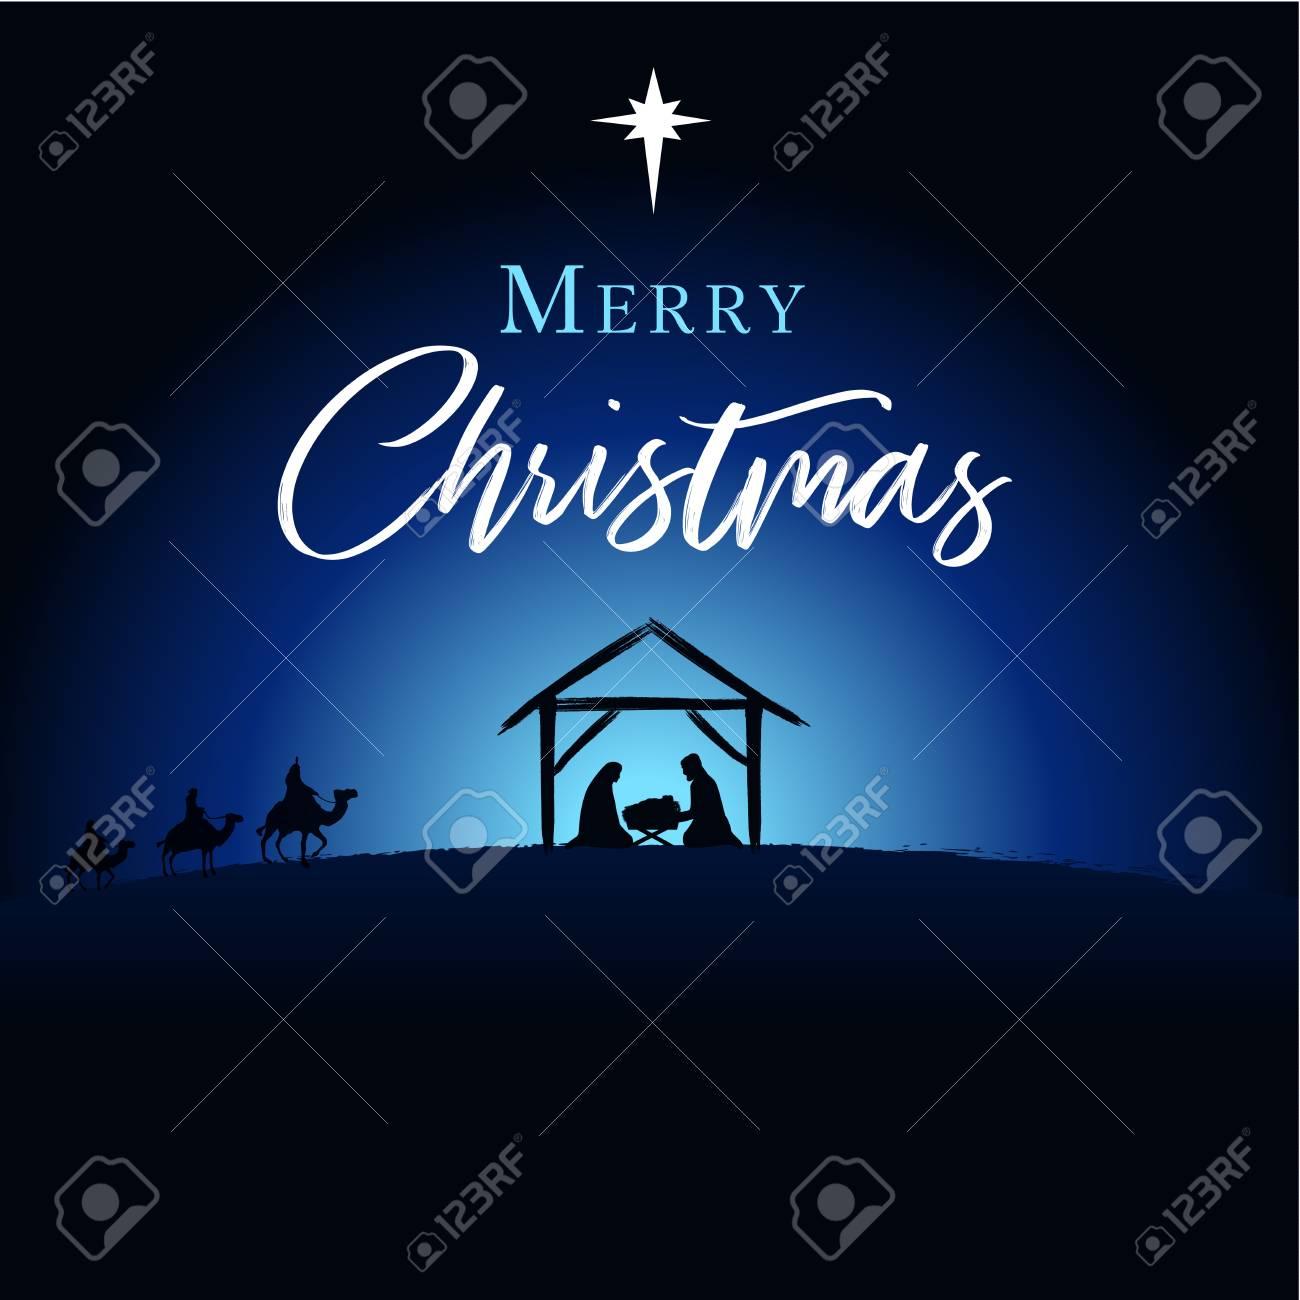 Merry Christmas Christian.Merry Christmas Birth Of Christ Greeting Card Jesus And Jesus